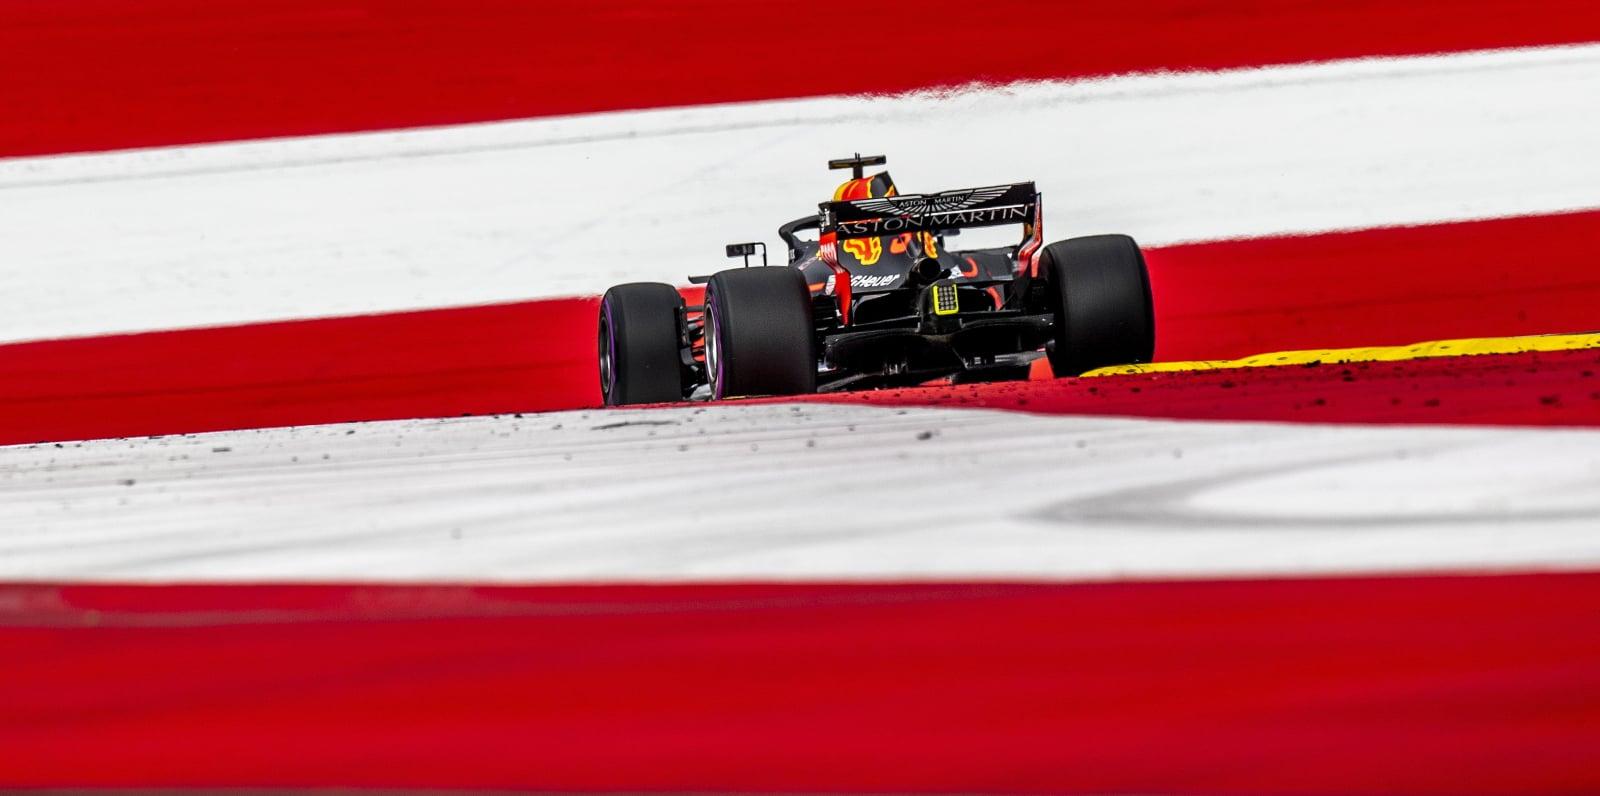 Daniel Ricciardo z Aston Martin Red Bull Racing na torze w Spielberg, Austria.  PAP/EPA/SRDJAN SUKI